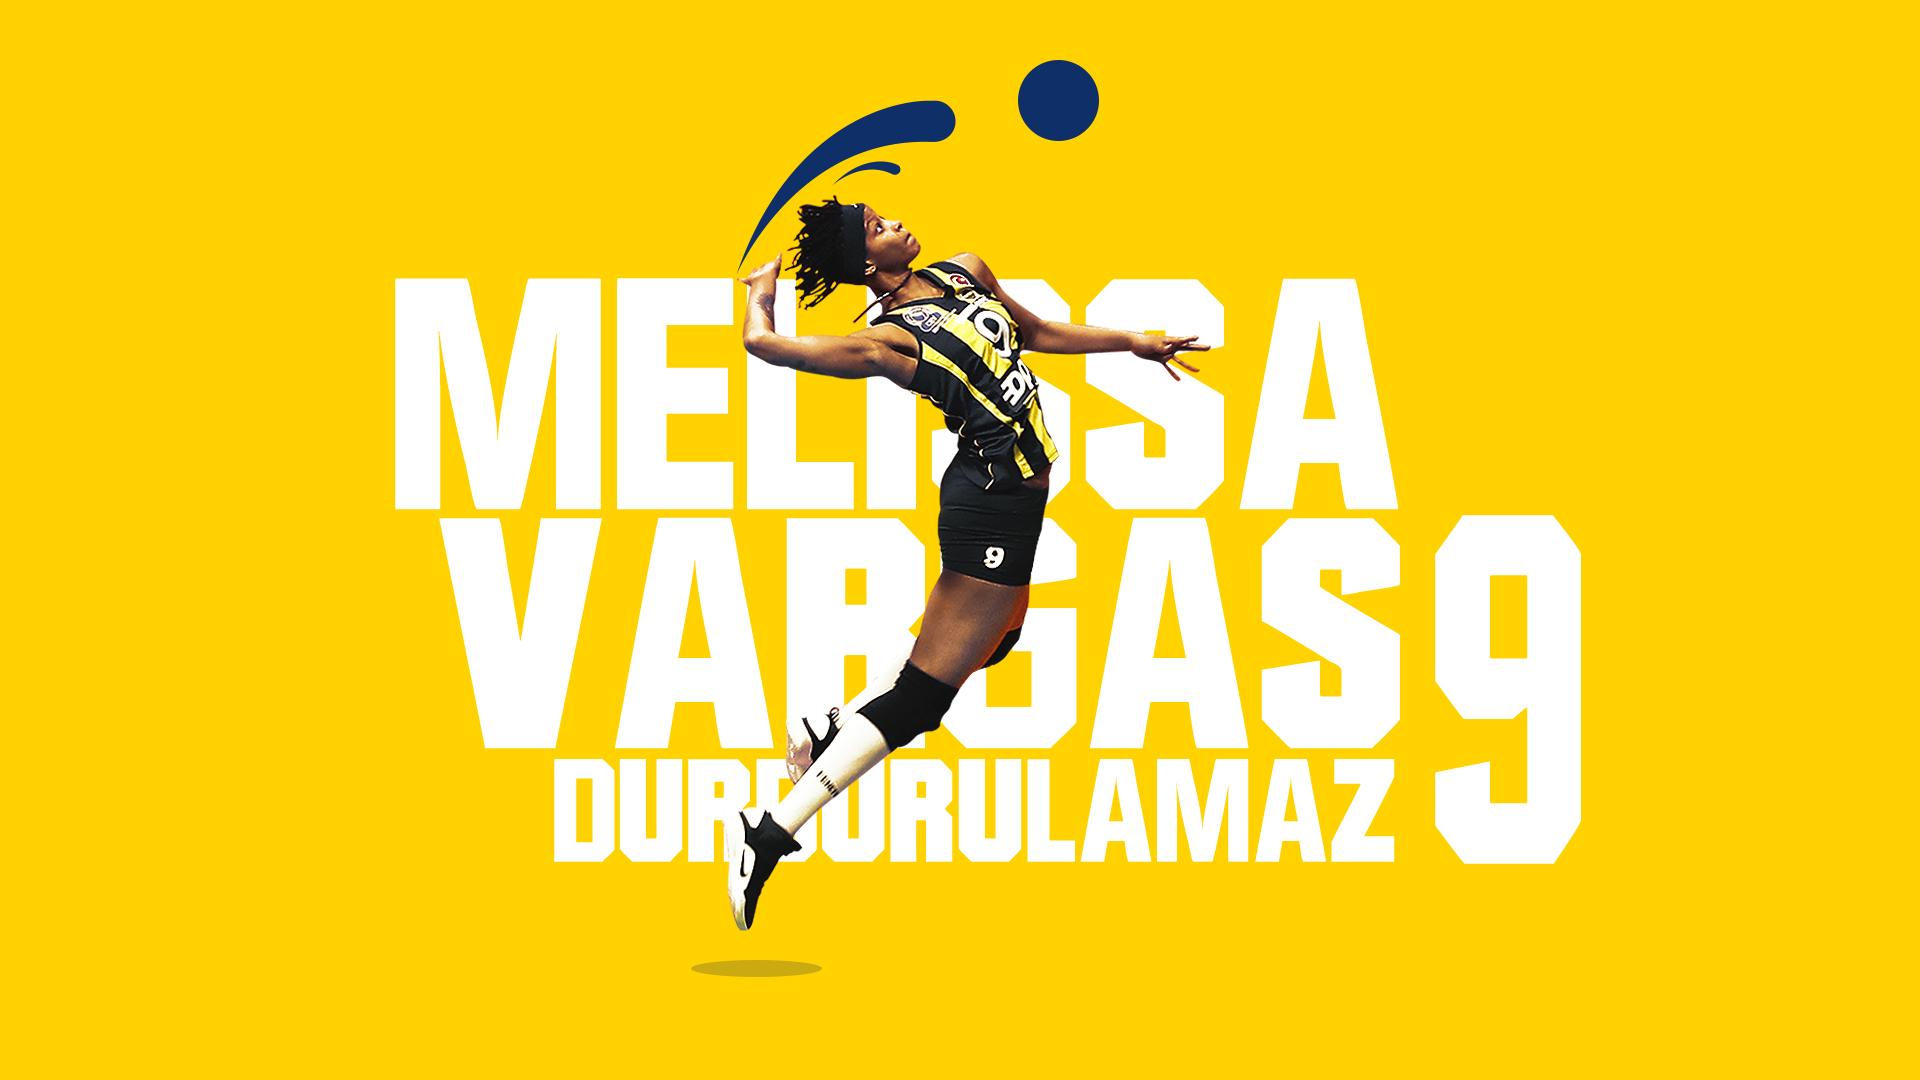 Melissa Vargas